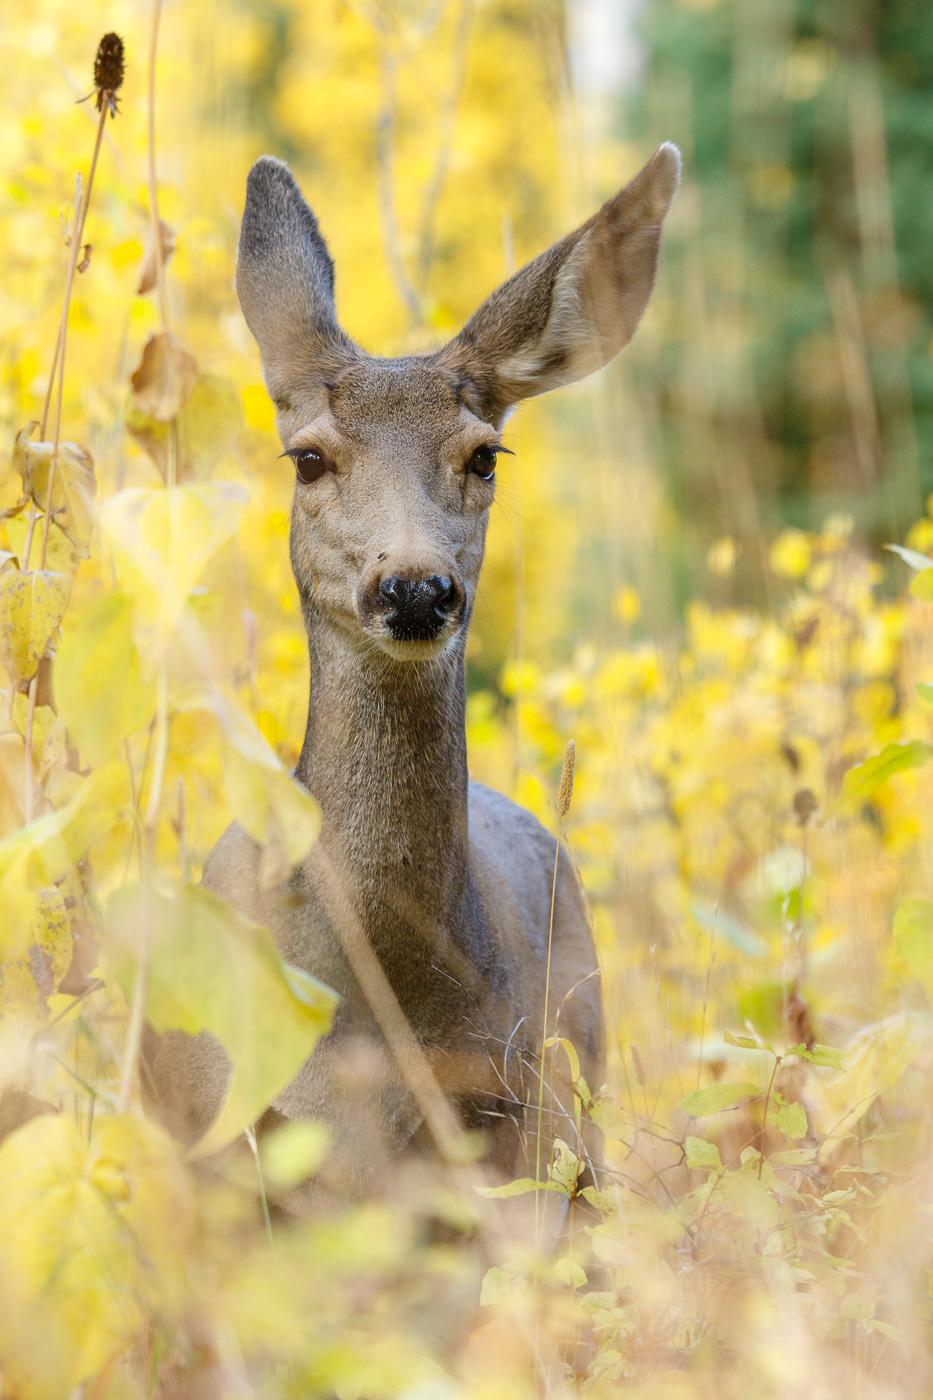 Mule Deer (Odocoileus hemionus), Grand Teton National Park, U.S.A. - Fauna de Nord-Amèrica - Raül Carmona - Fotografia, Fotografia d'estudi, esdeveniments i Natura